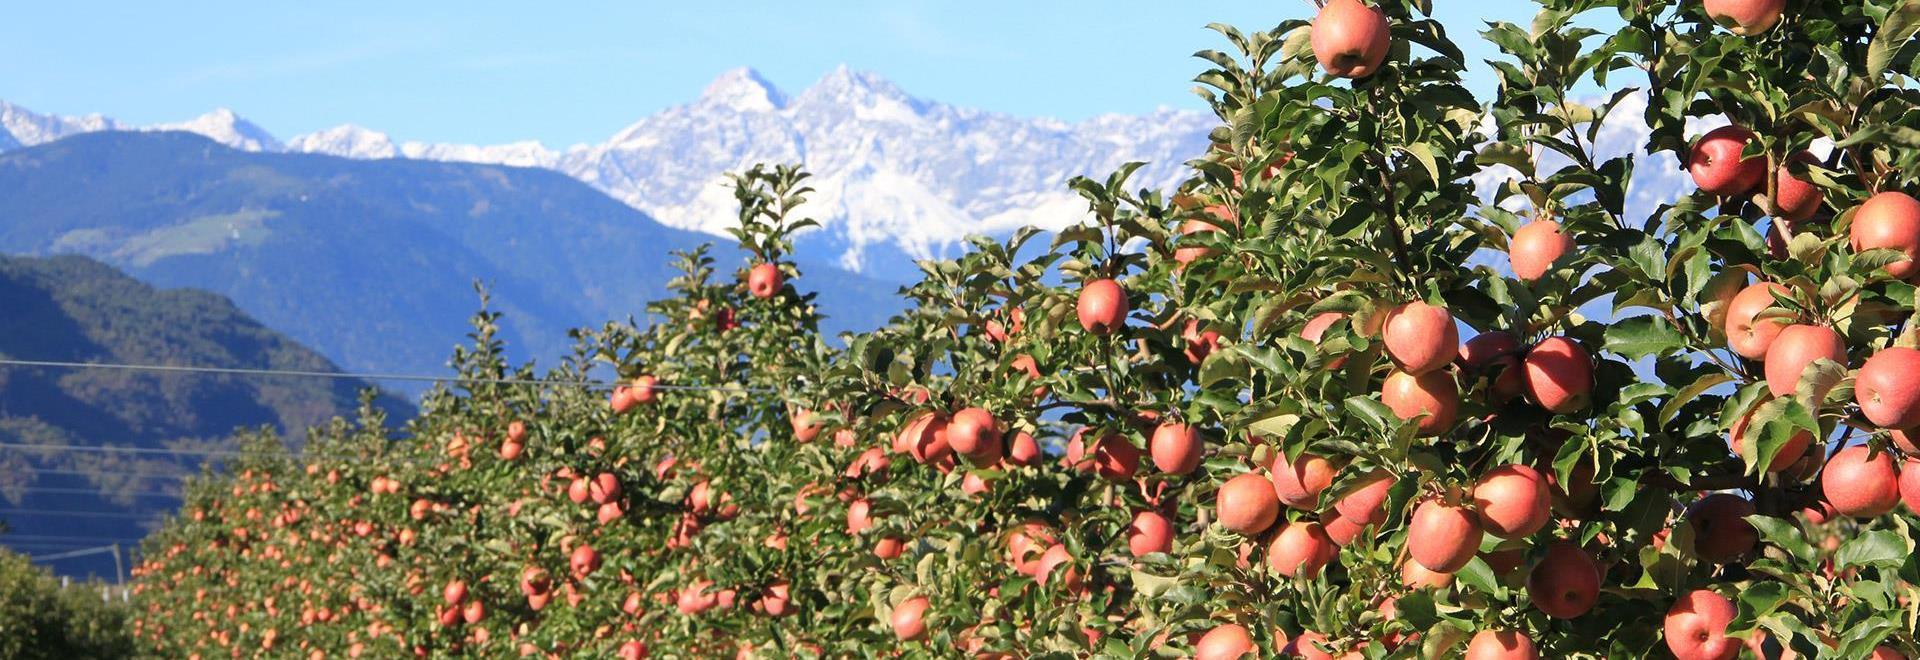 Apfelernte in Meran Apfel